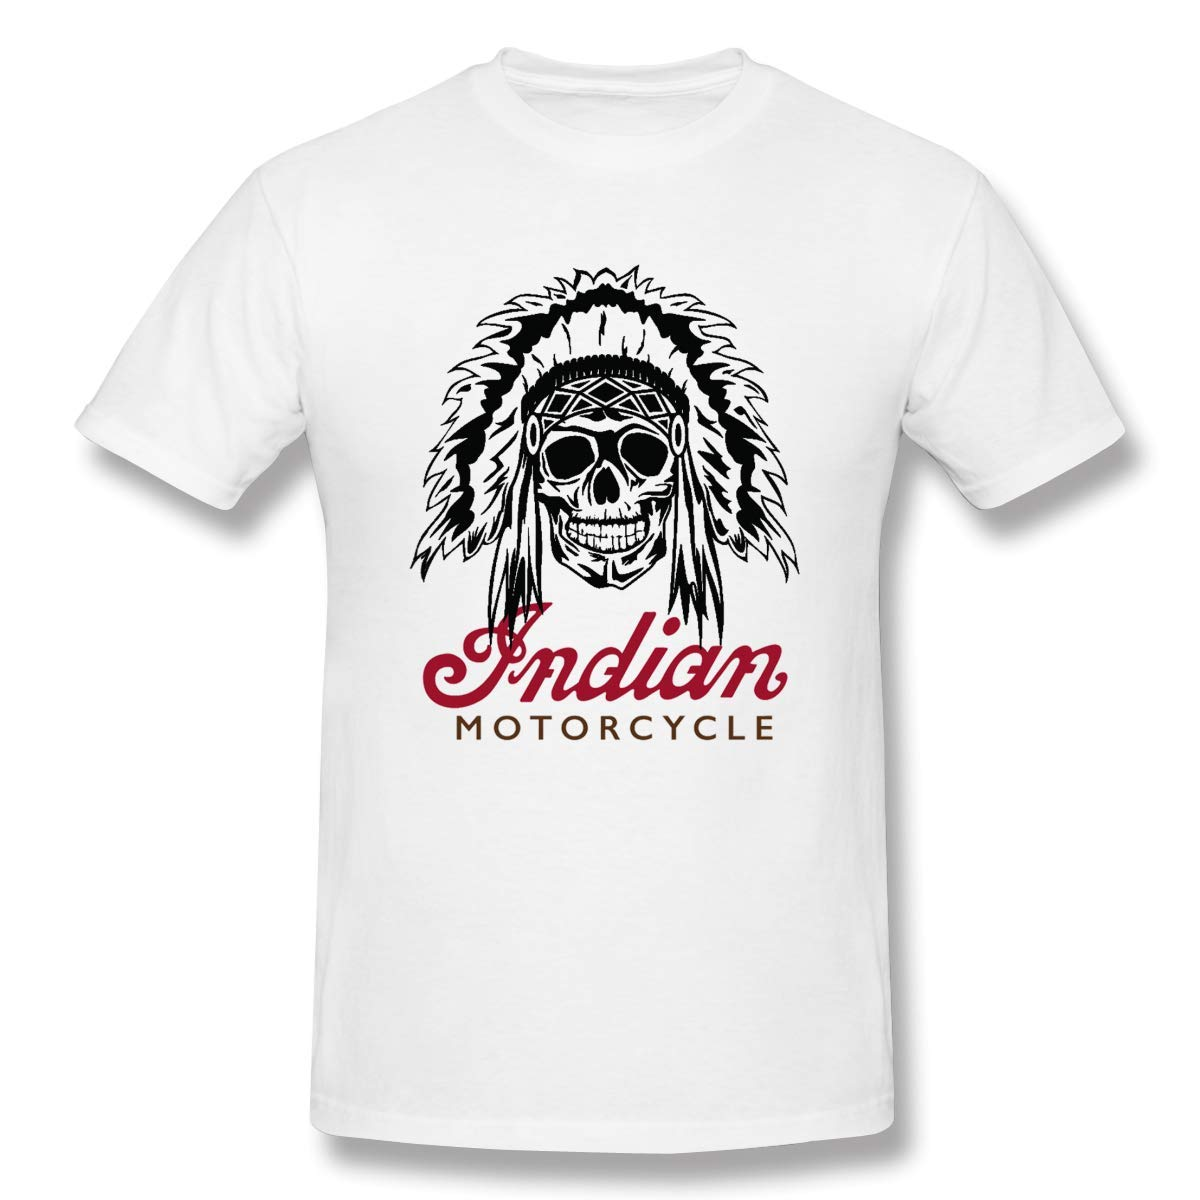 XEEQEE Indian-Motorcycle T-Shirt Unisesx Men Women Youth Cotton Tee